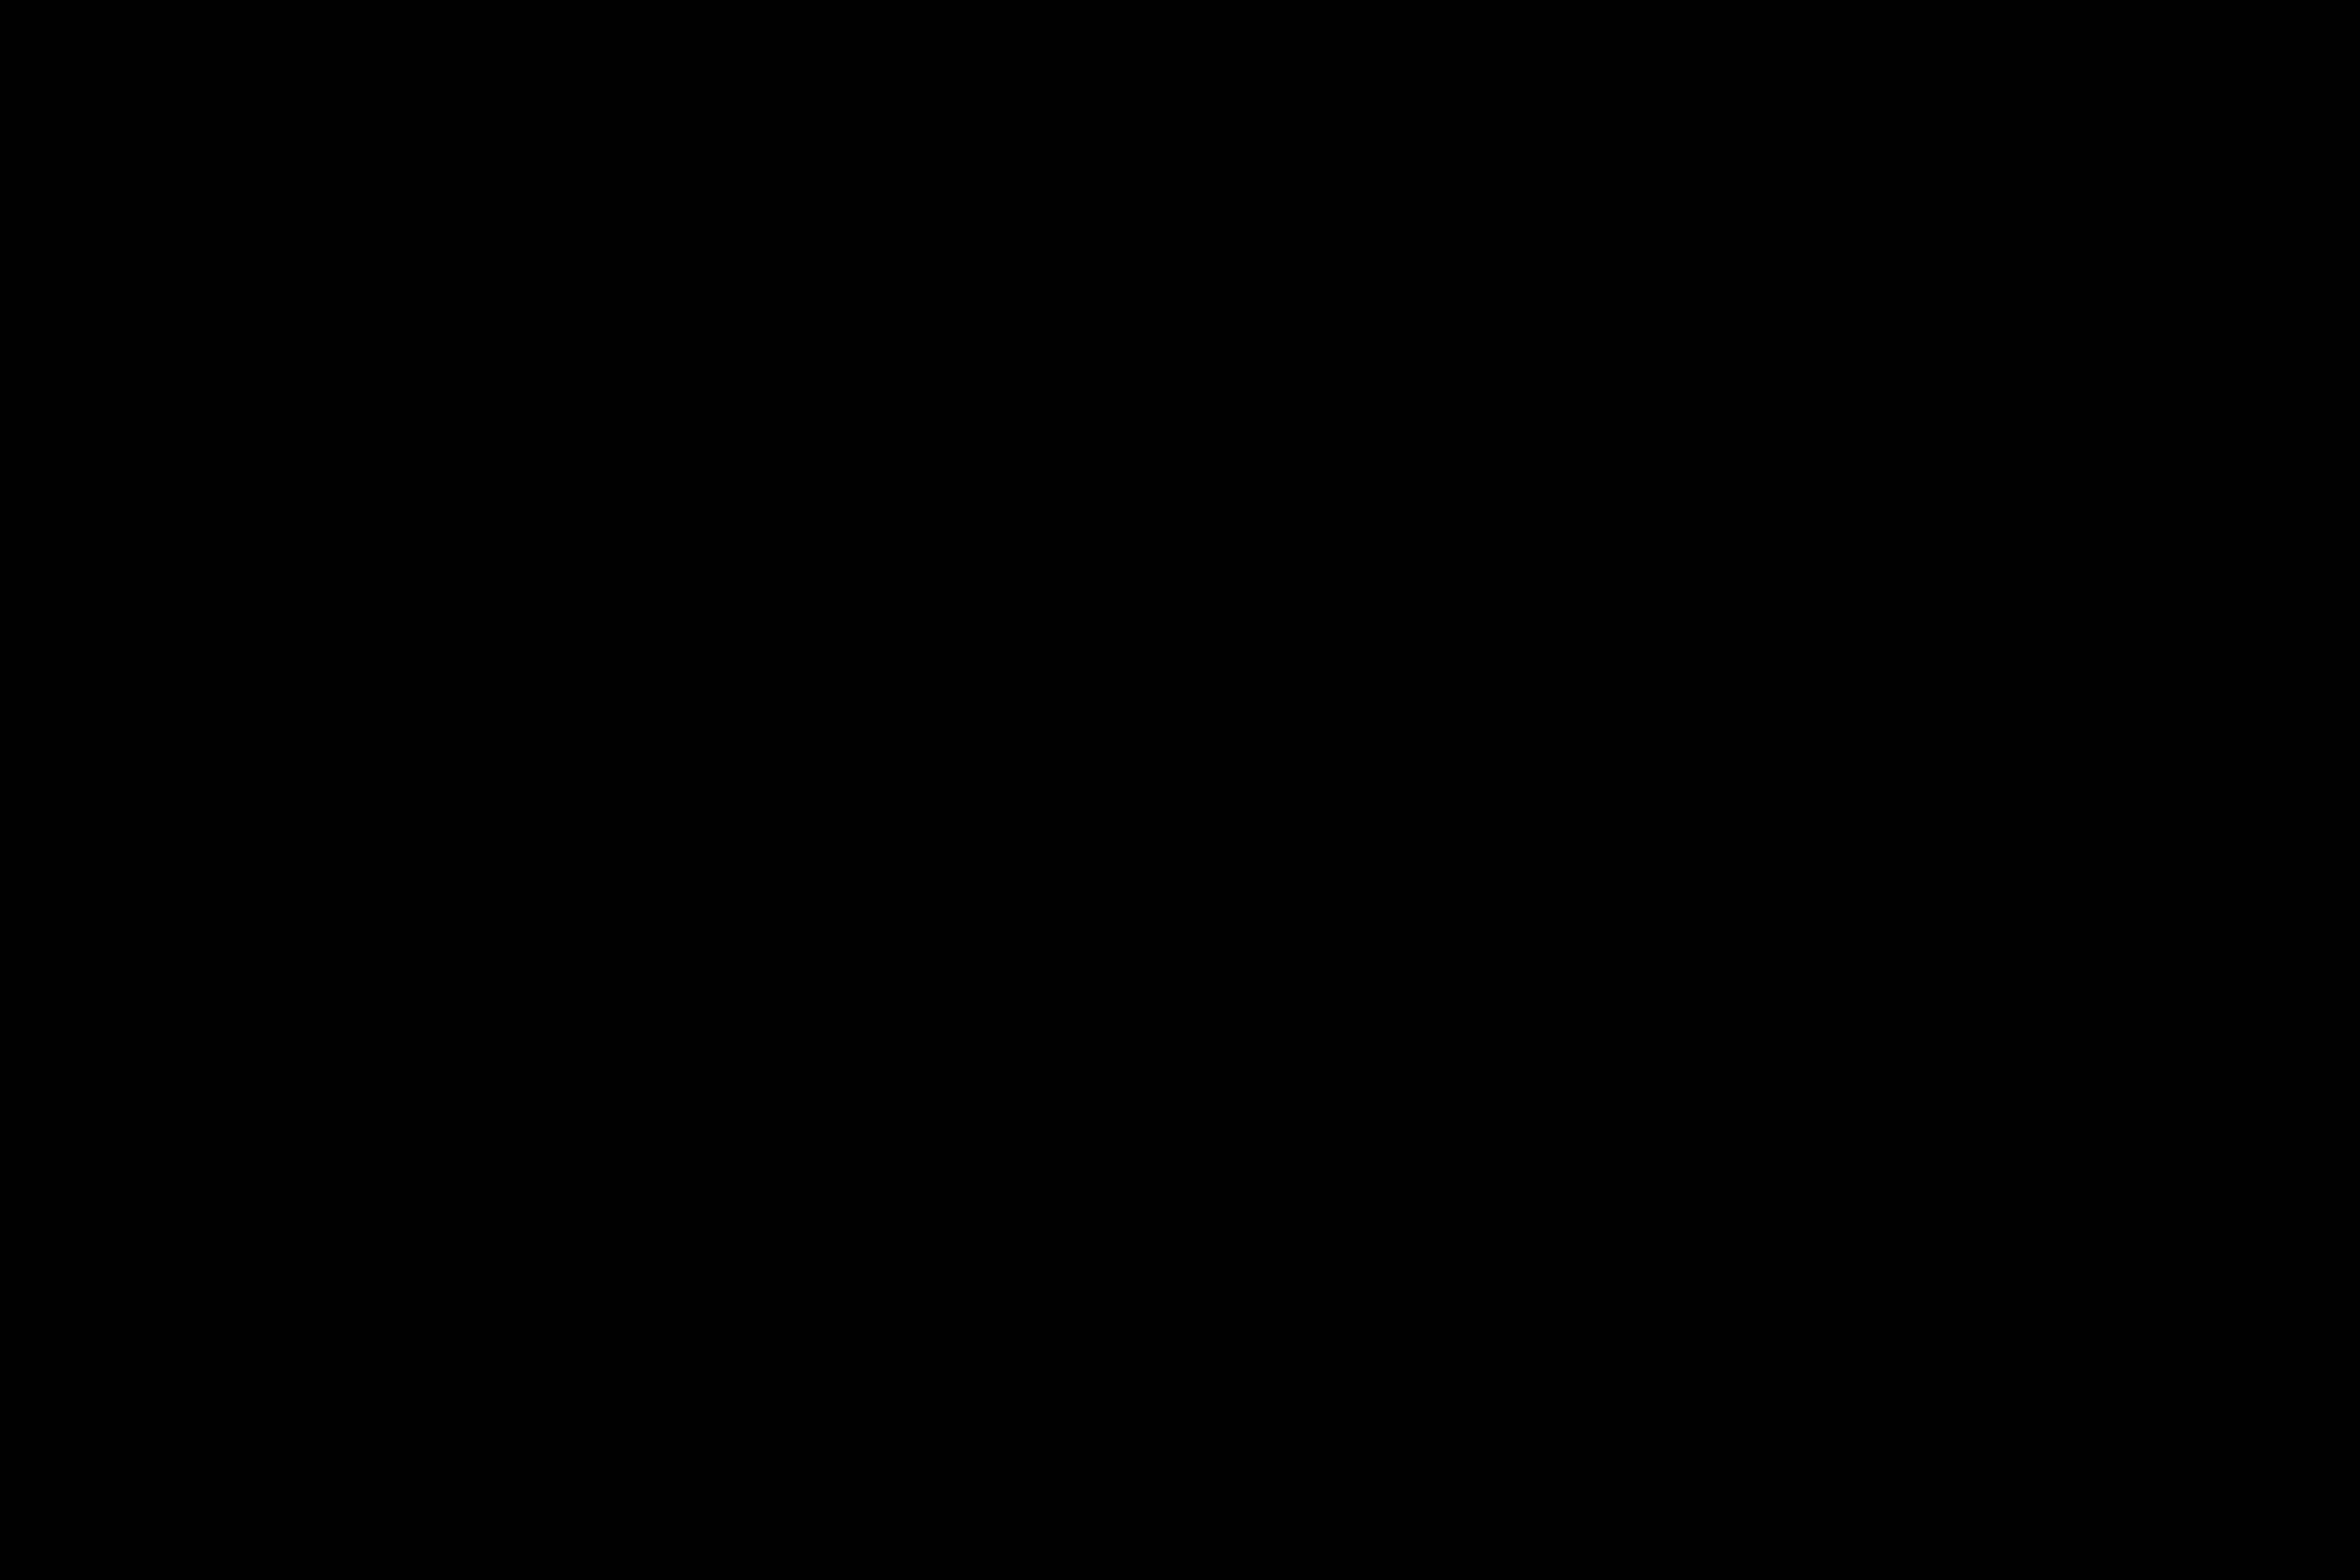 GÖTTI // Structure of Shades